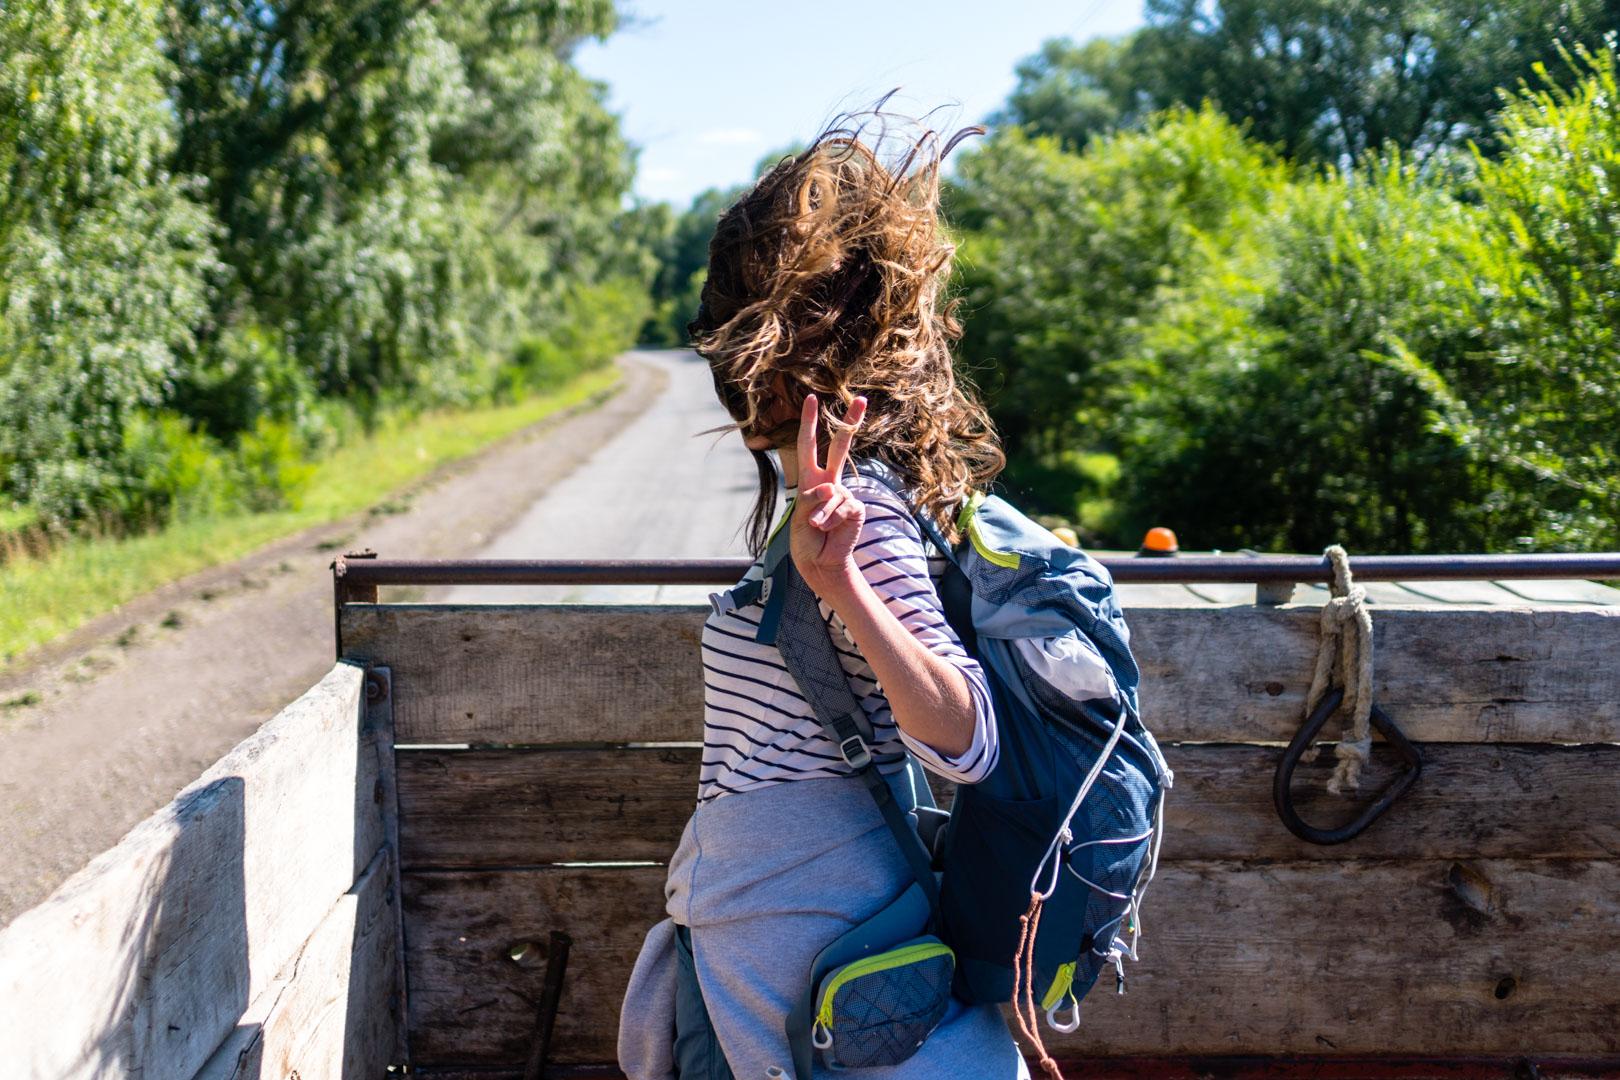 SerialHikers stop autostop world monde tour hitchhiking aventure adventure alternative travel voyage sans avion no fly kirghizistan kyrgyzstan jyrgalan gestes signification different meaning